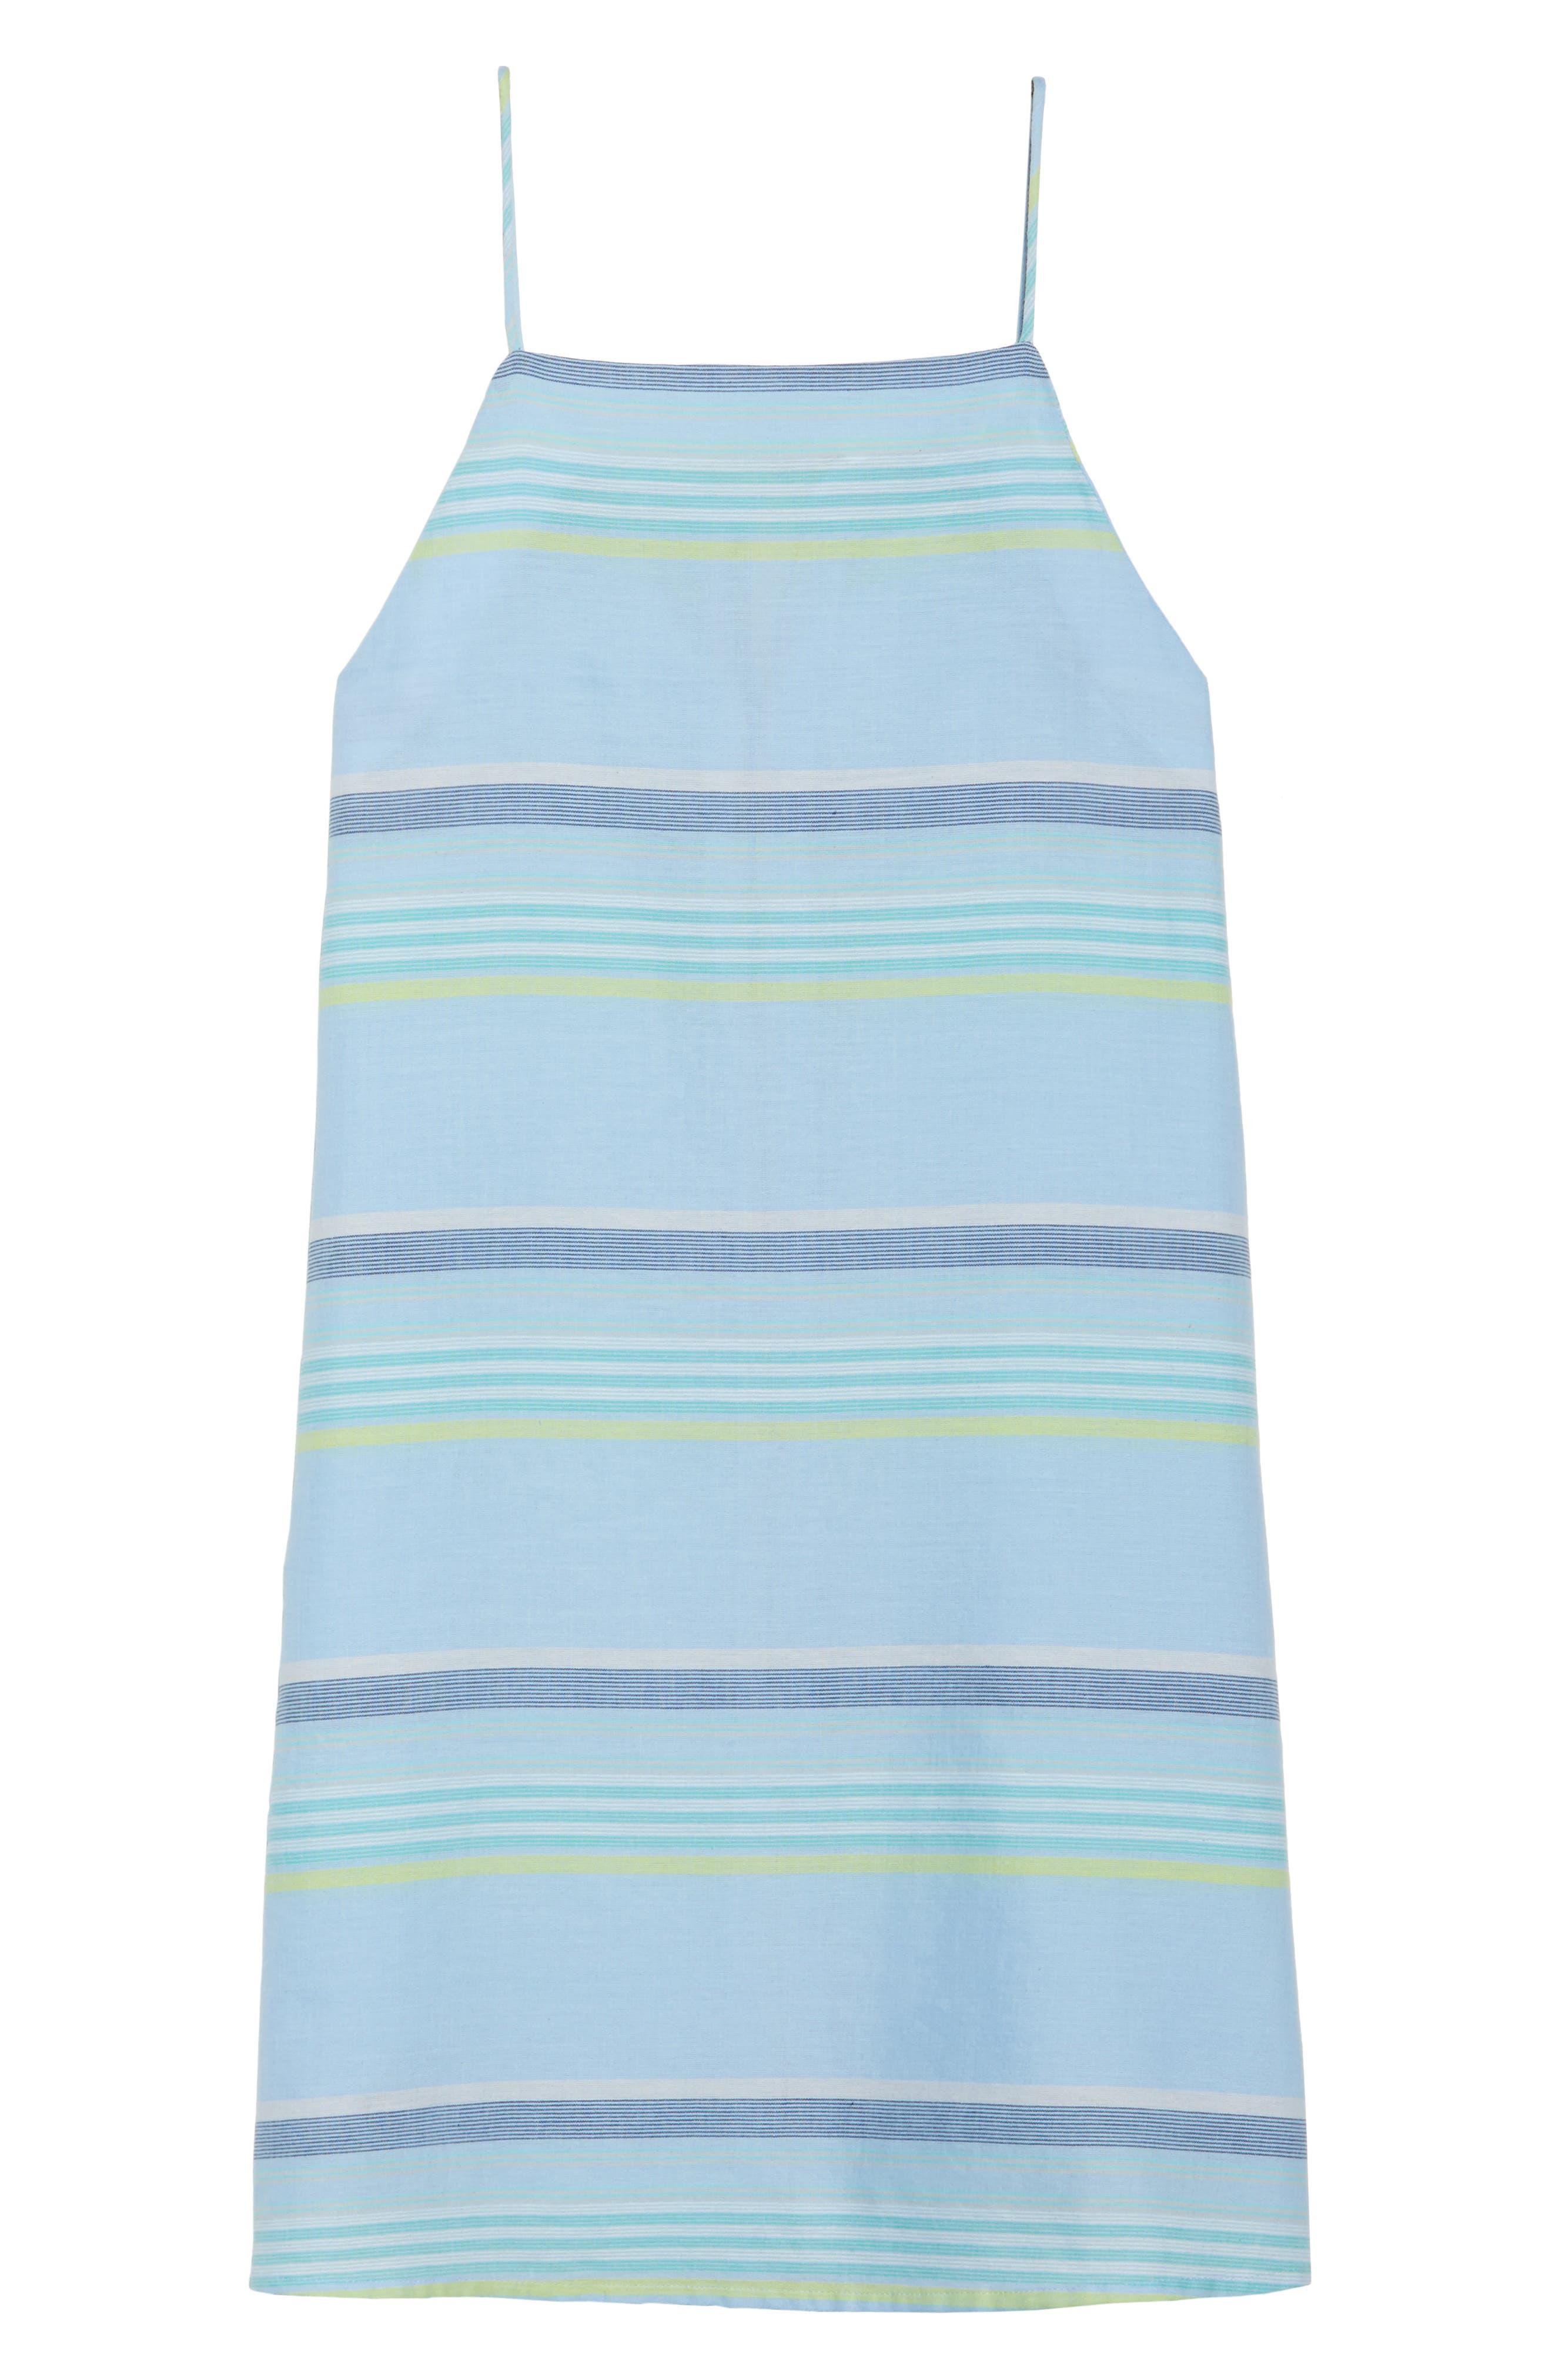 Sunset Stripe Cover-Up Dress,                             Alternate thumbnail 6, color,                             Sky Blue